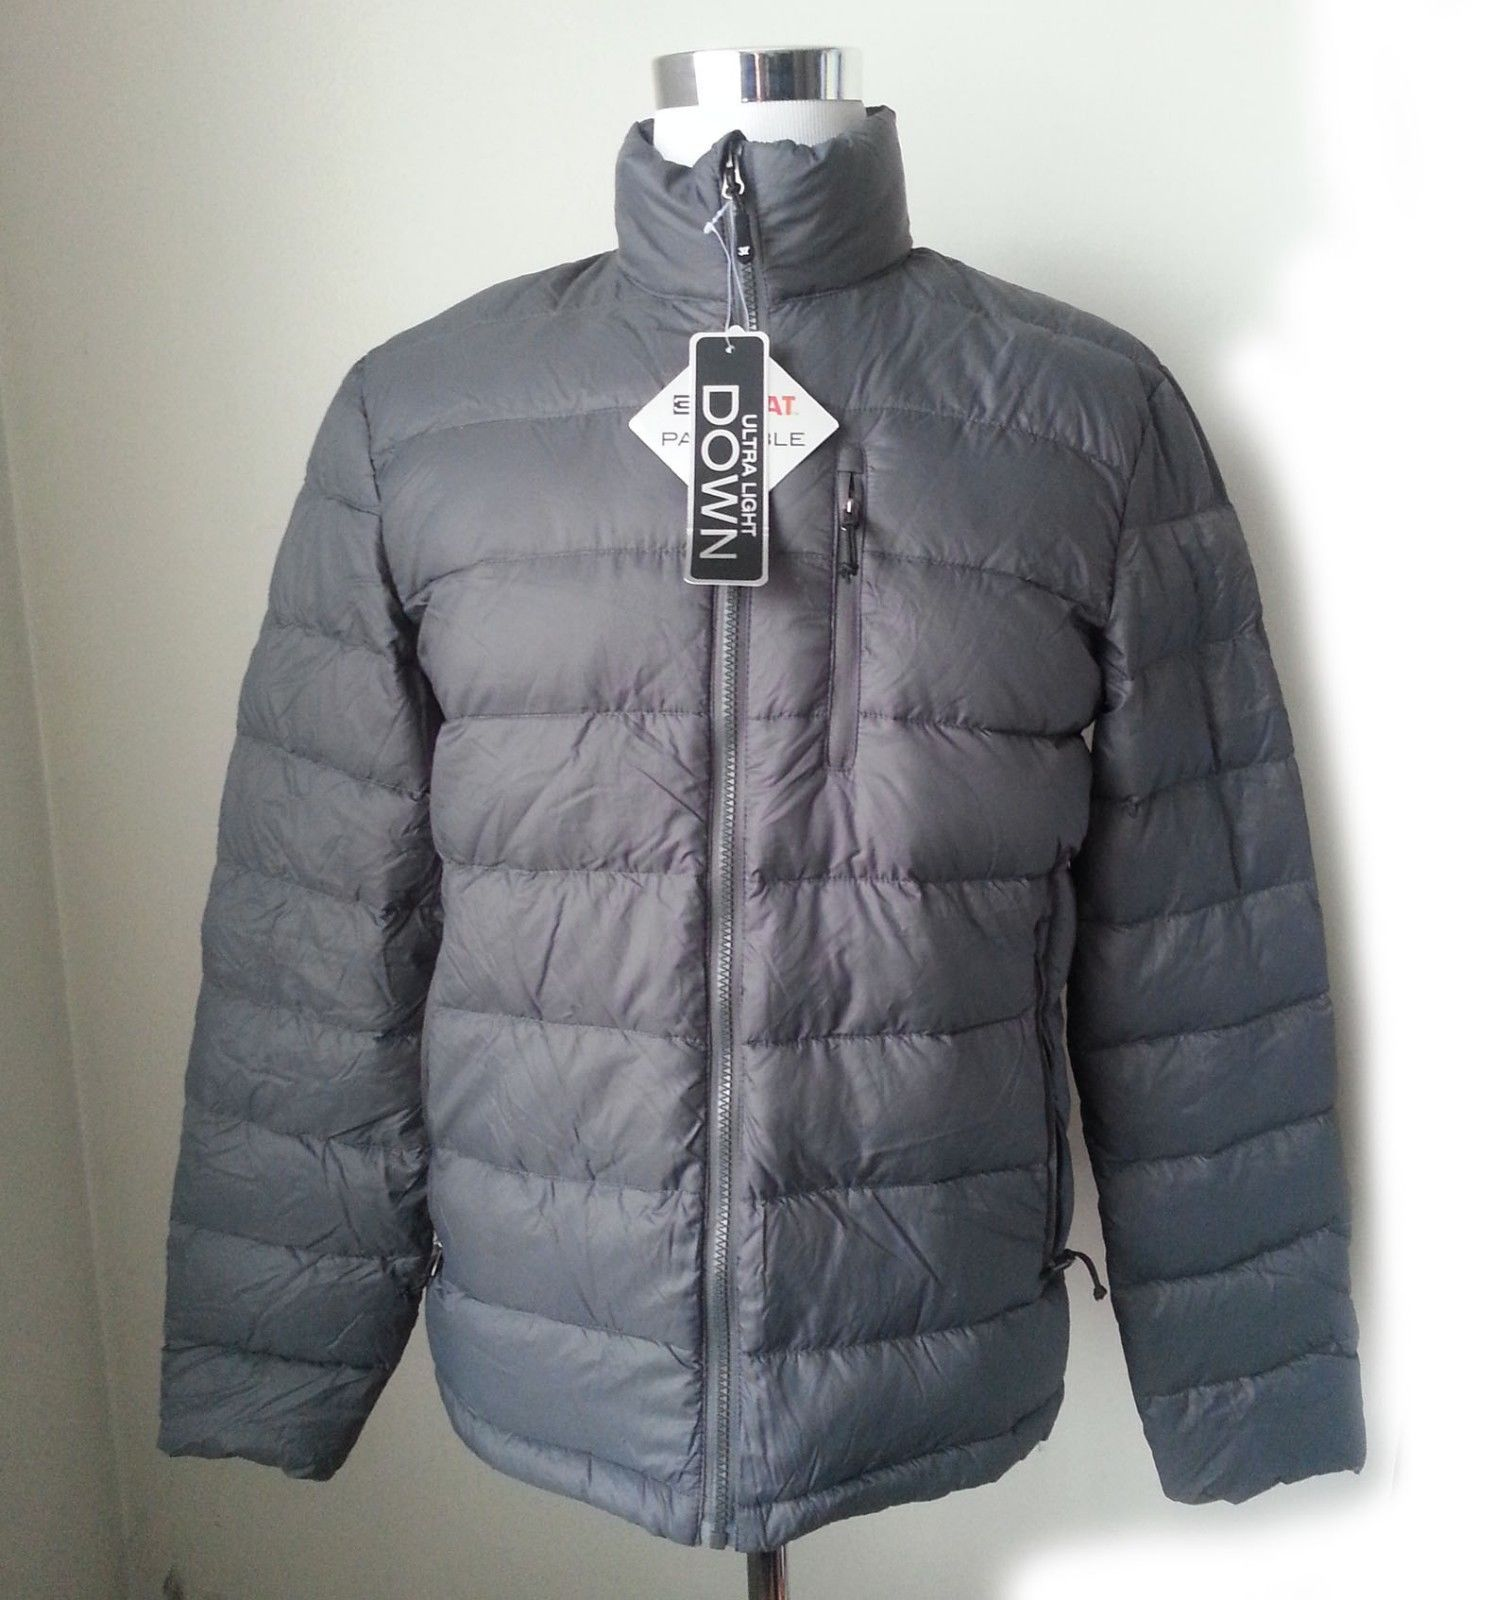 SALE Tommy Hilfiger zip up fleece hoodie jacket NWT